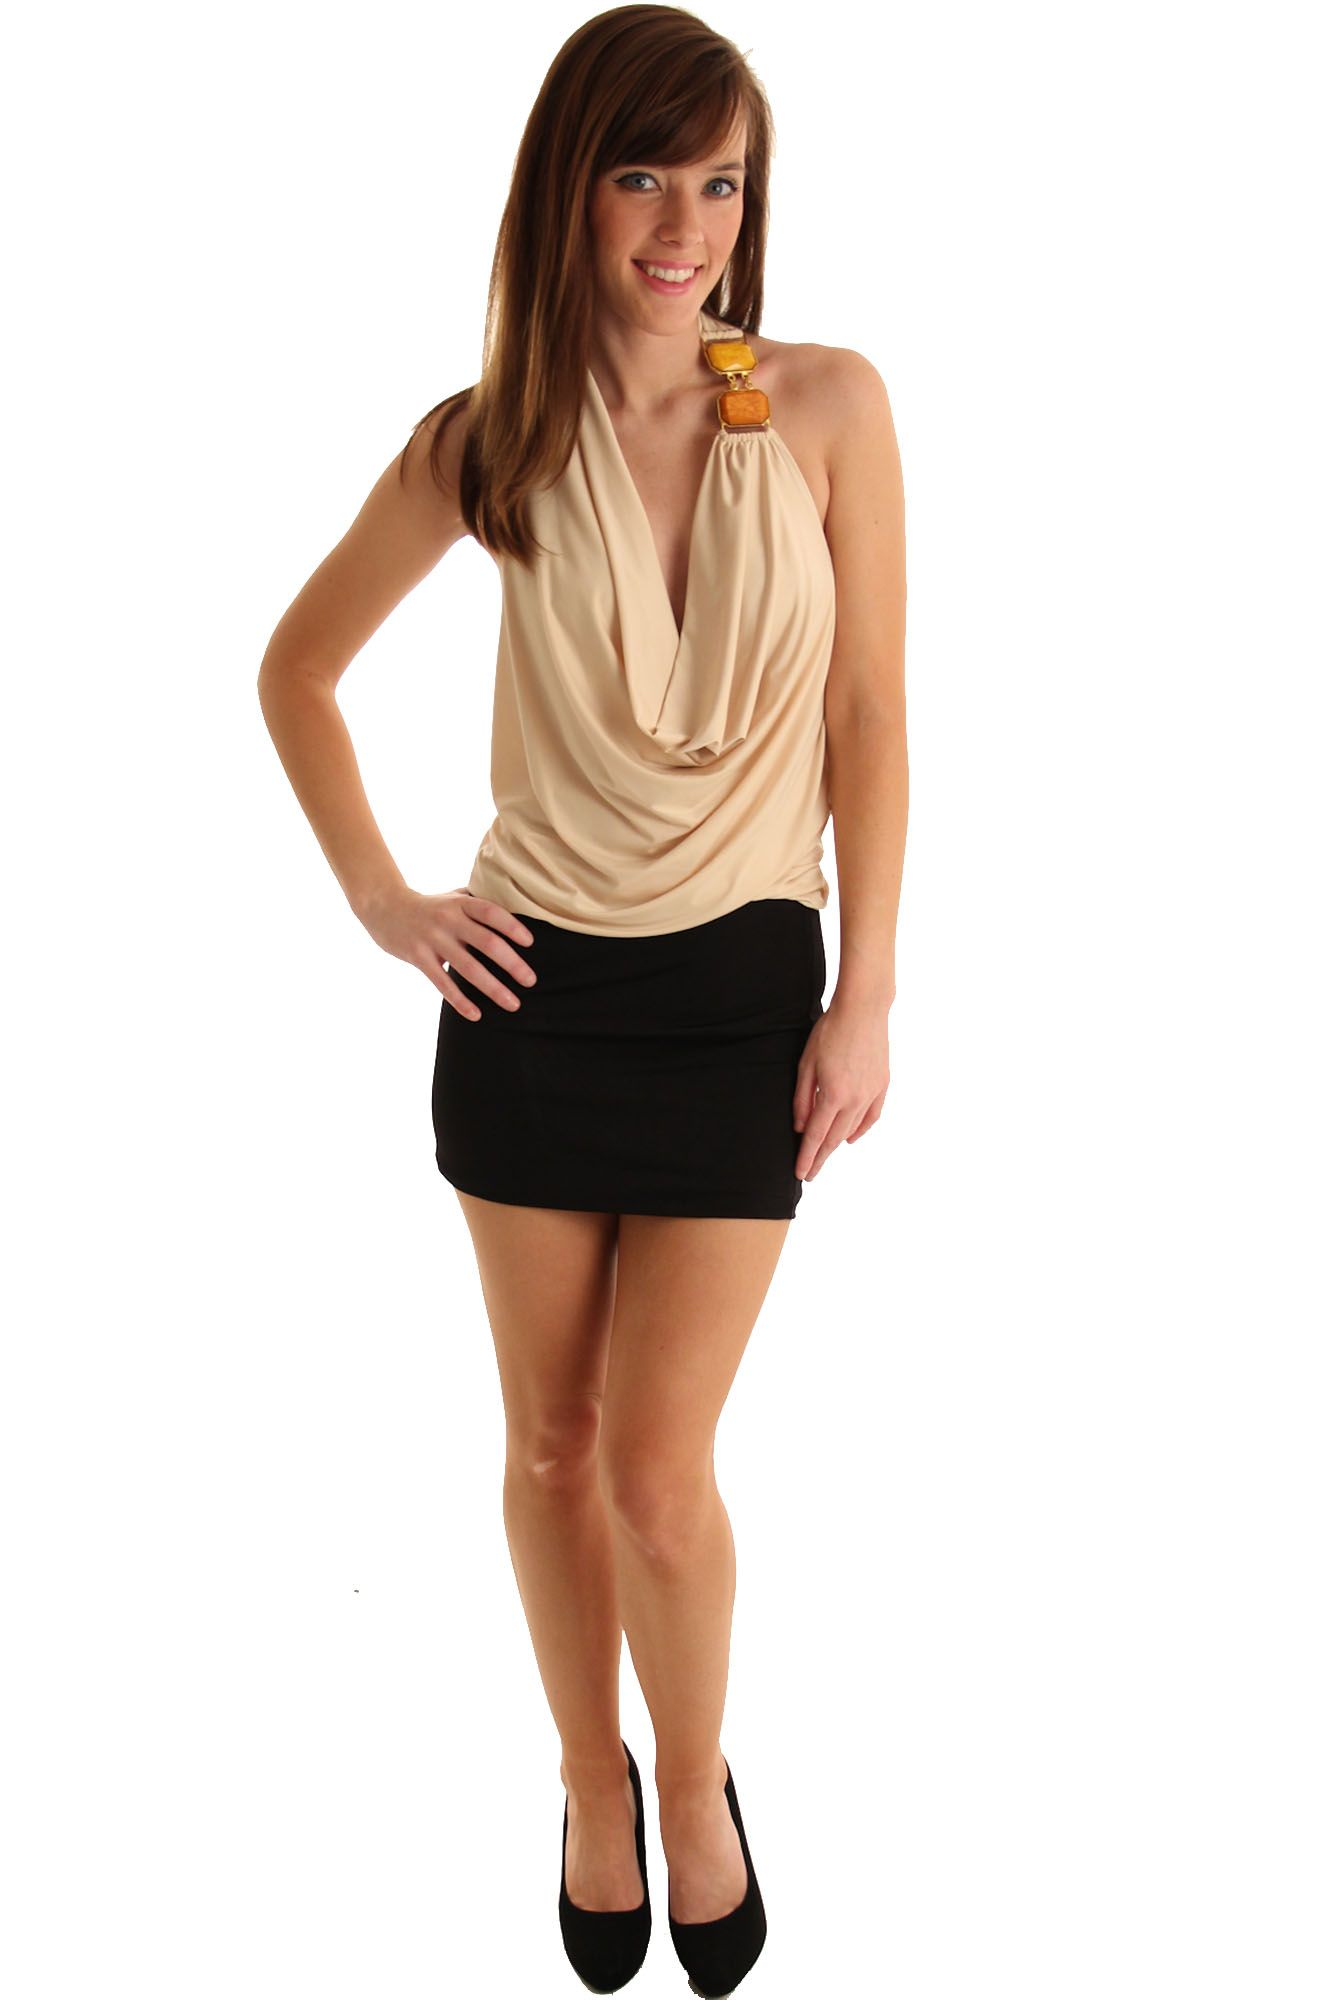 Cream black sassy plunged rhinestone micro halter dress purchase now